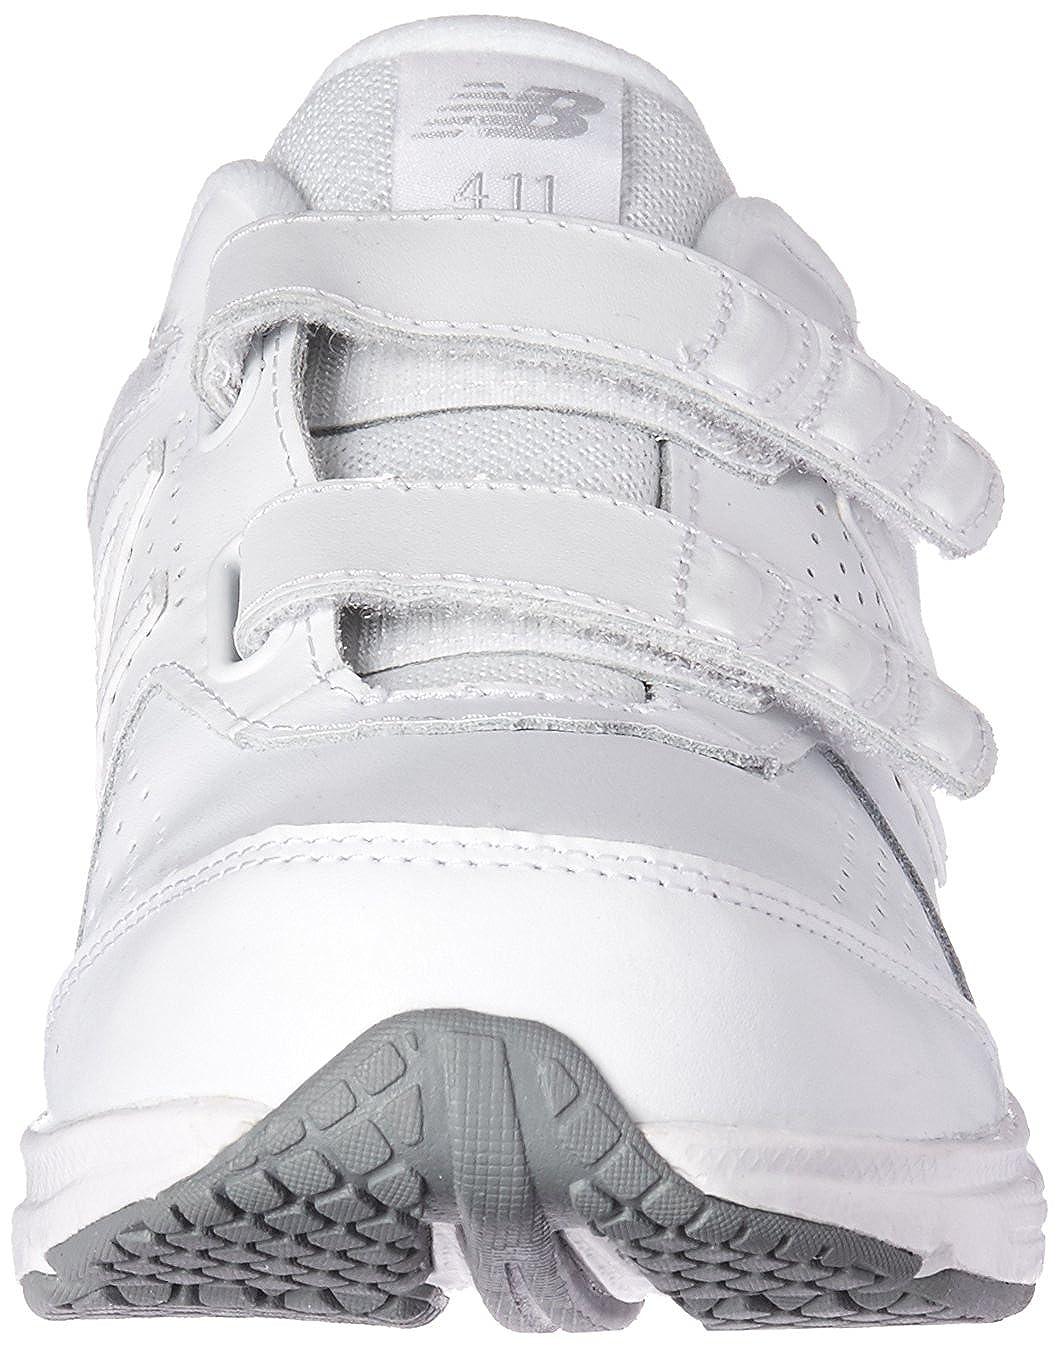 New New New Balance Damen WW411WT2 Walking schuhe Weiß 37 EU 8fb8a7